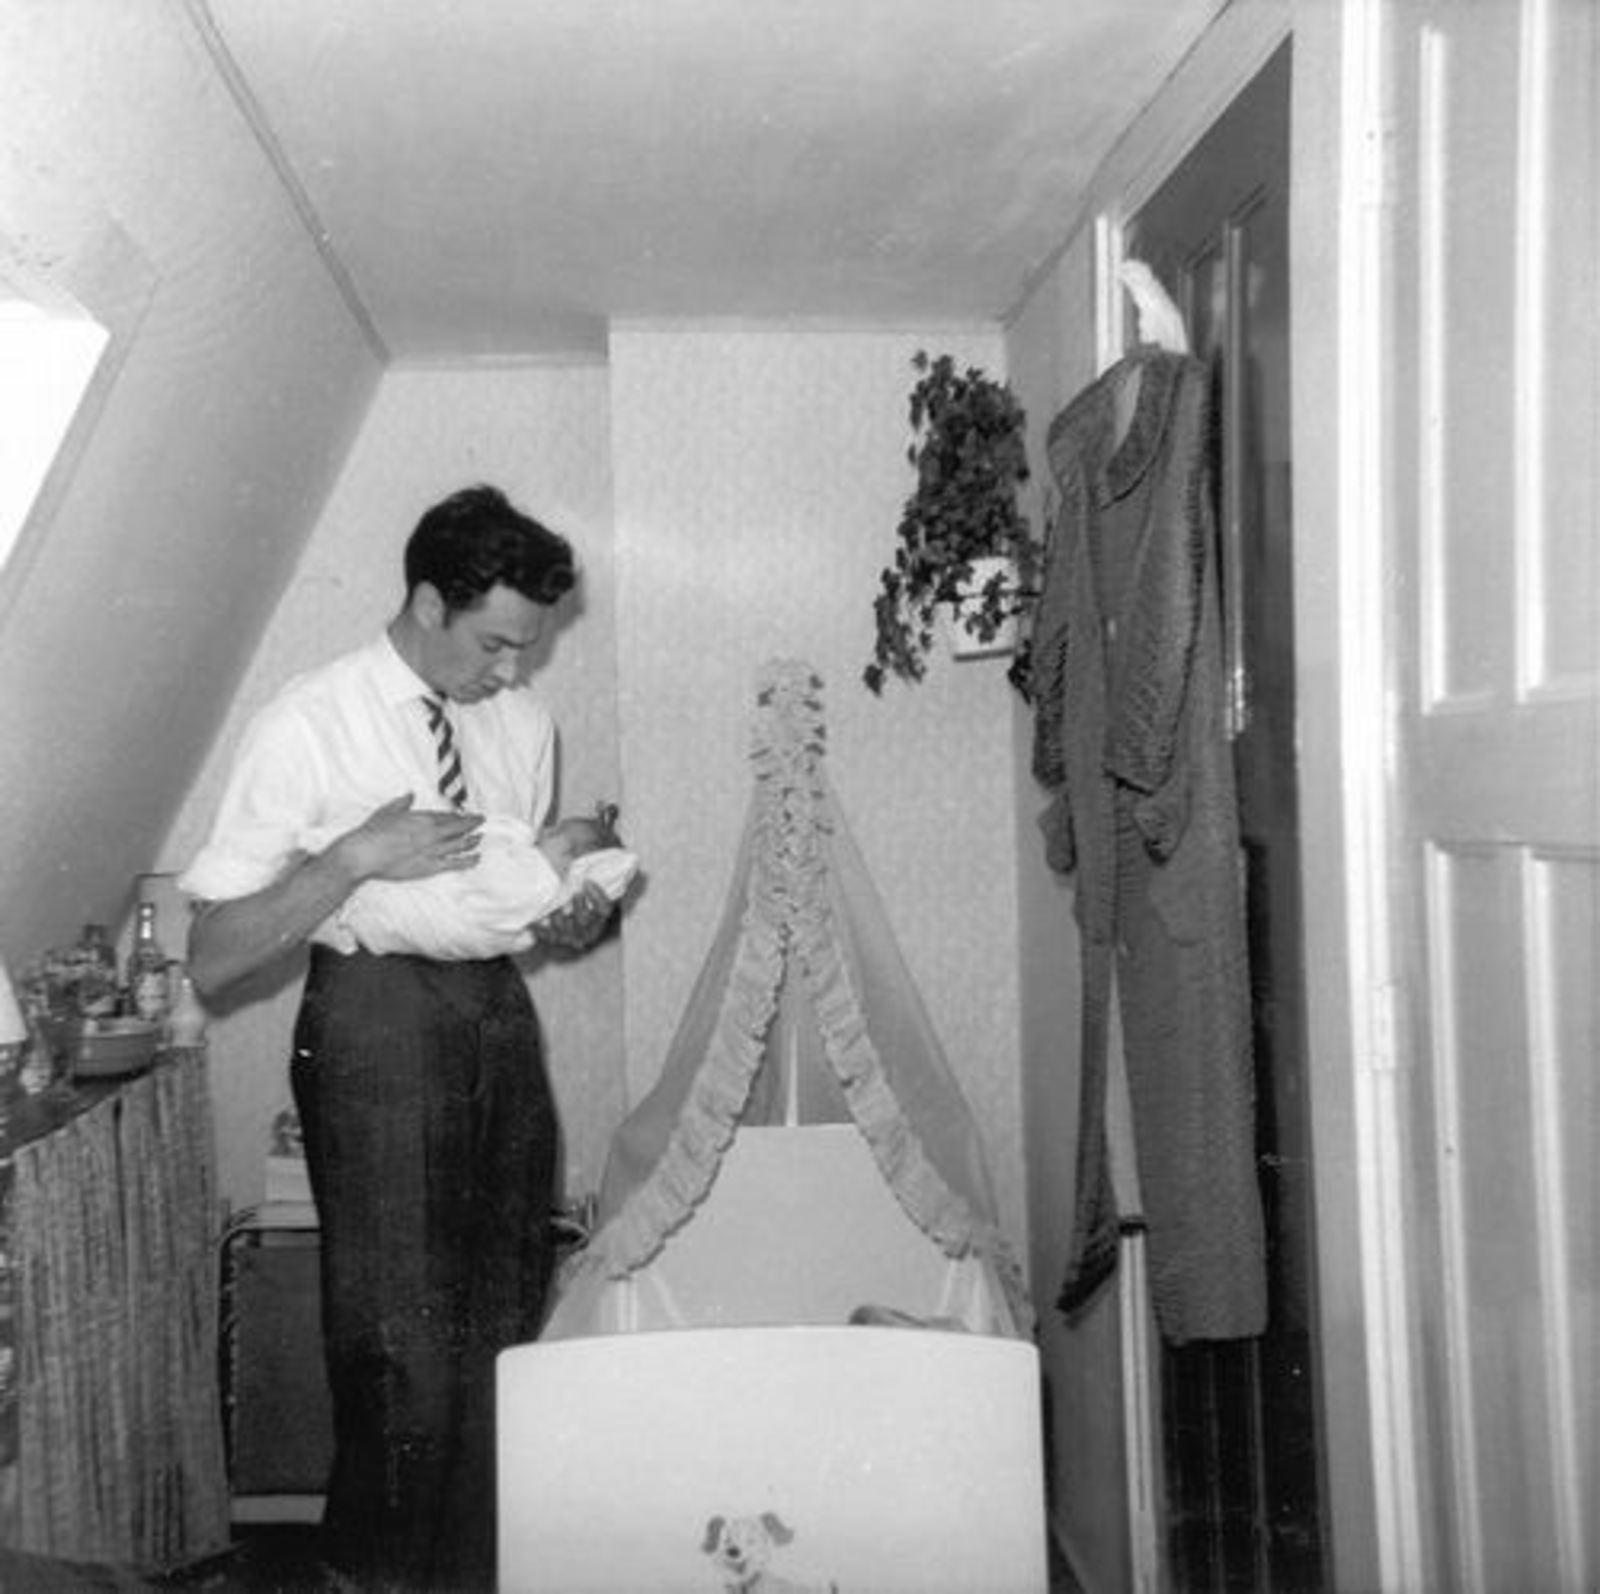 Koeckhoven Cor 1939 1963 zoon Edwin als baby 00